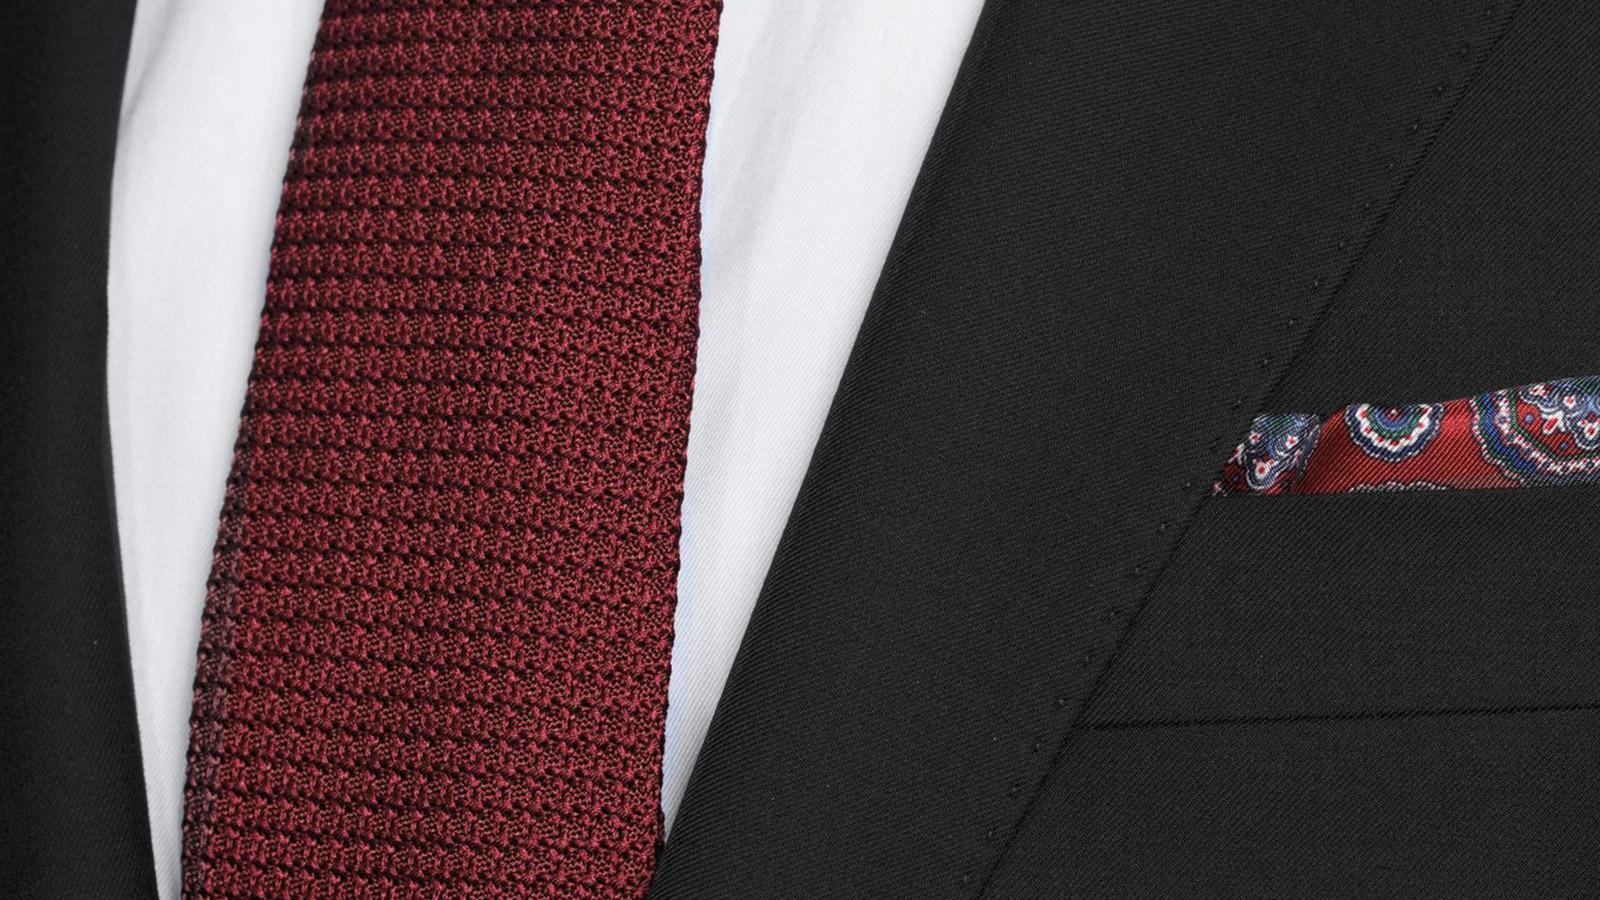 Suit in Solid Black Wool - slider image 1